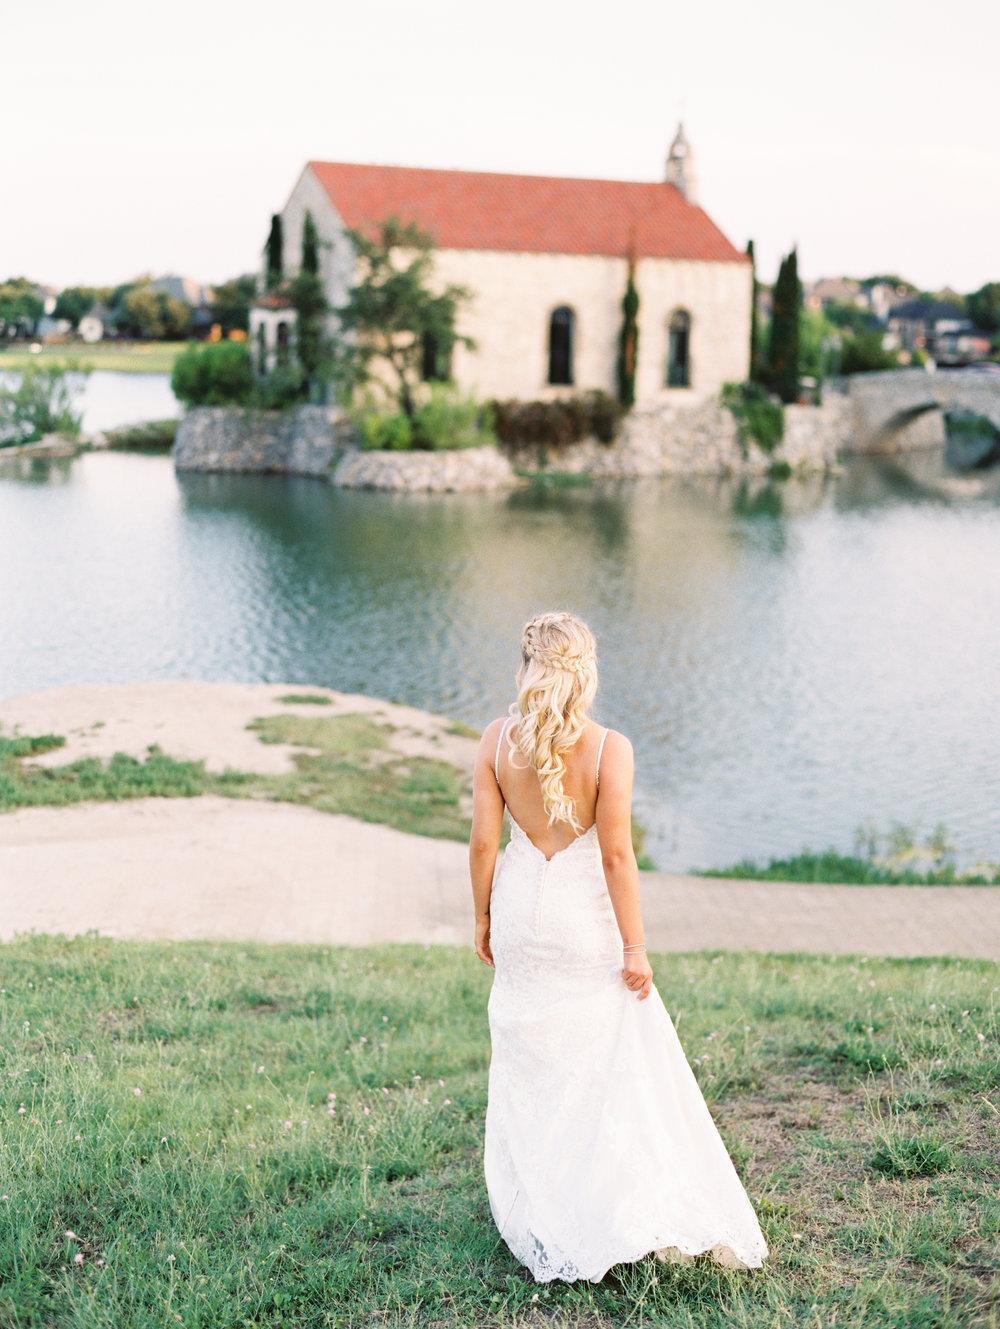 mckinney-texas-bella-donna-chapel-bridals-ar-photography-brianna-187.jpg